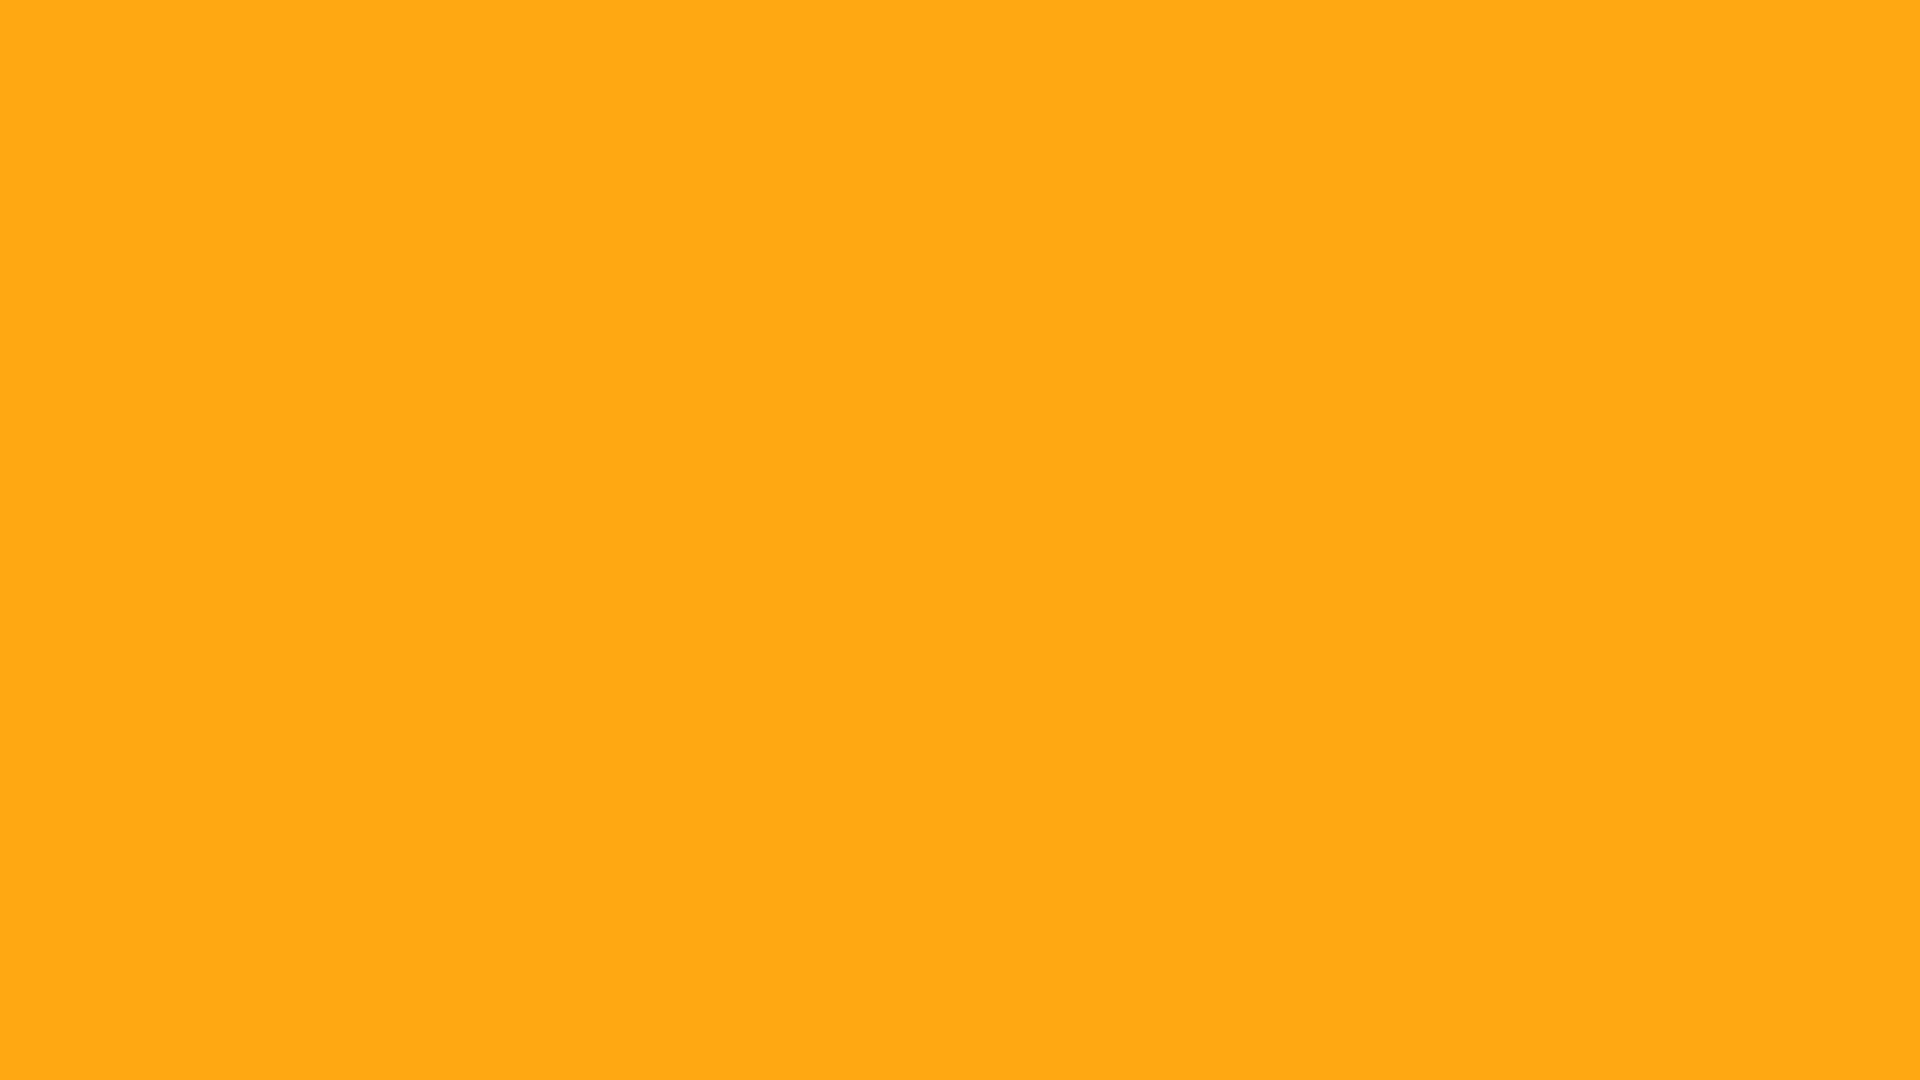 1920x1080 Dark Tangerine Solid Color Background